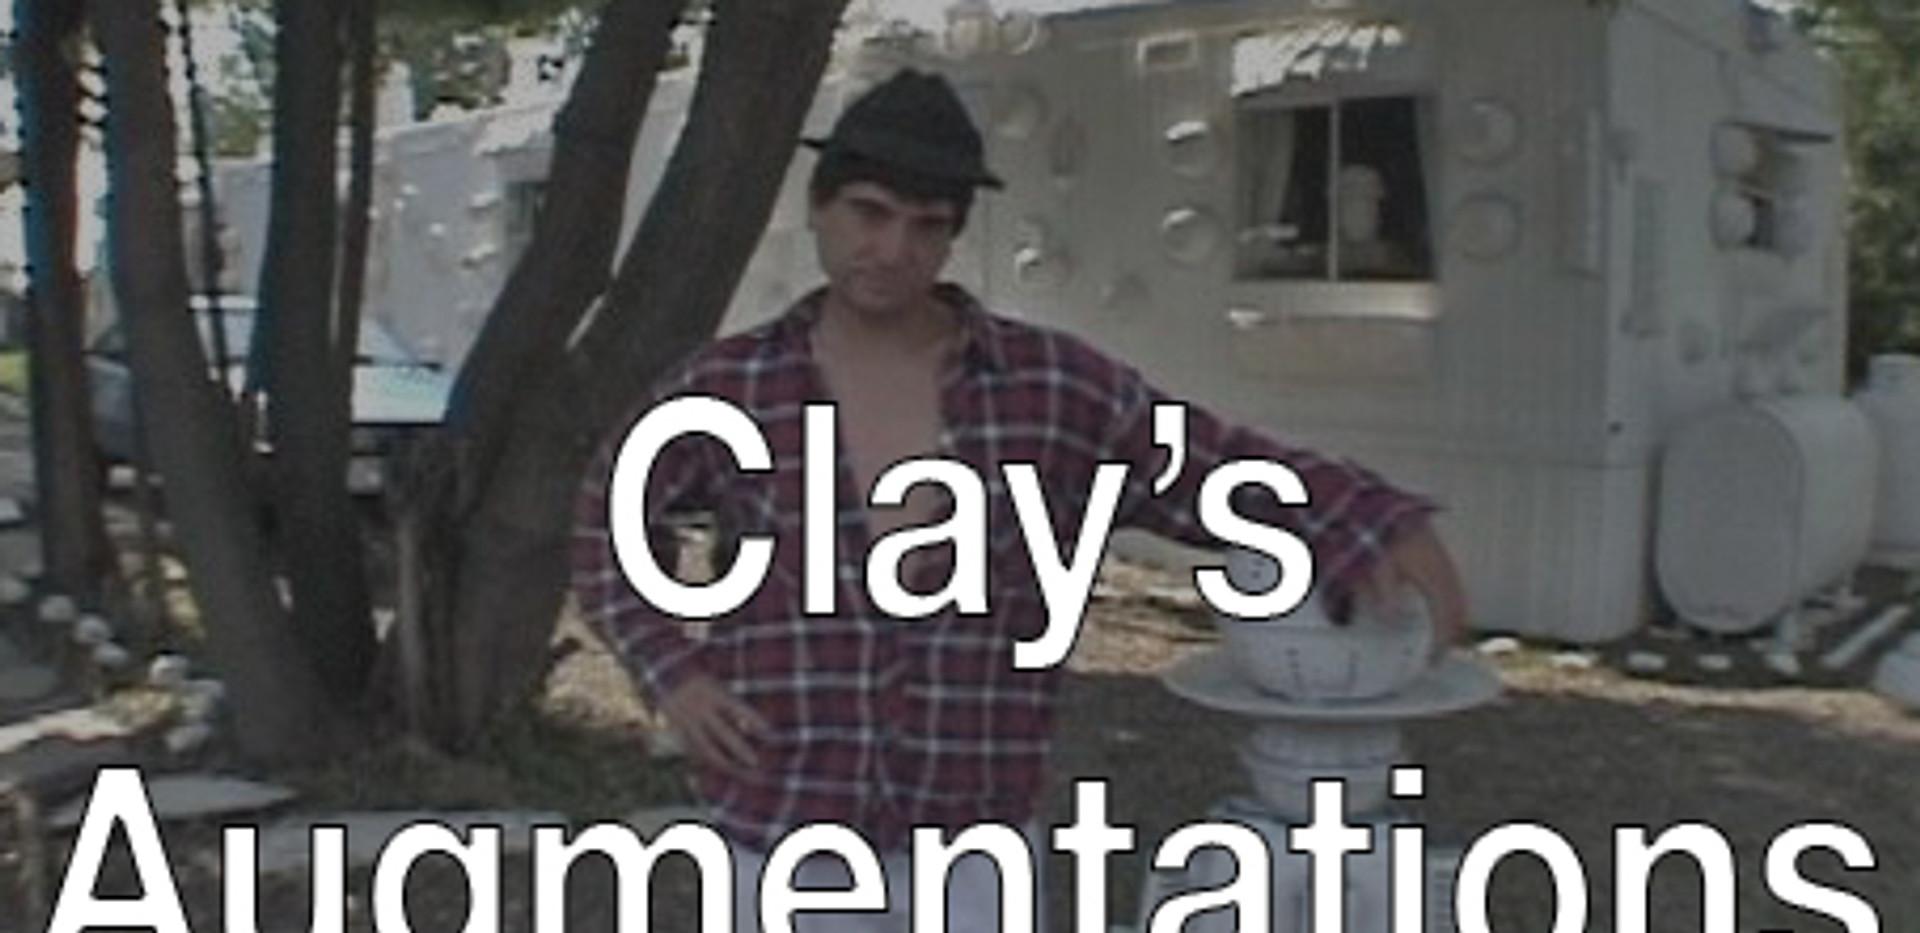 Clay's Augmentations